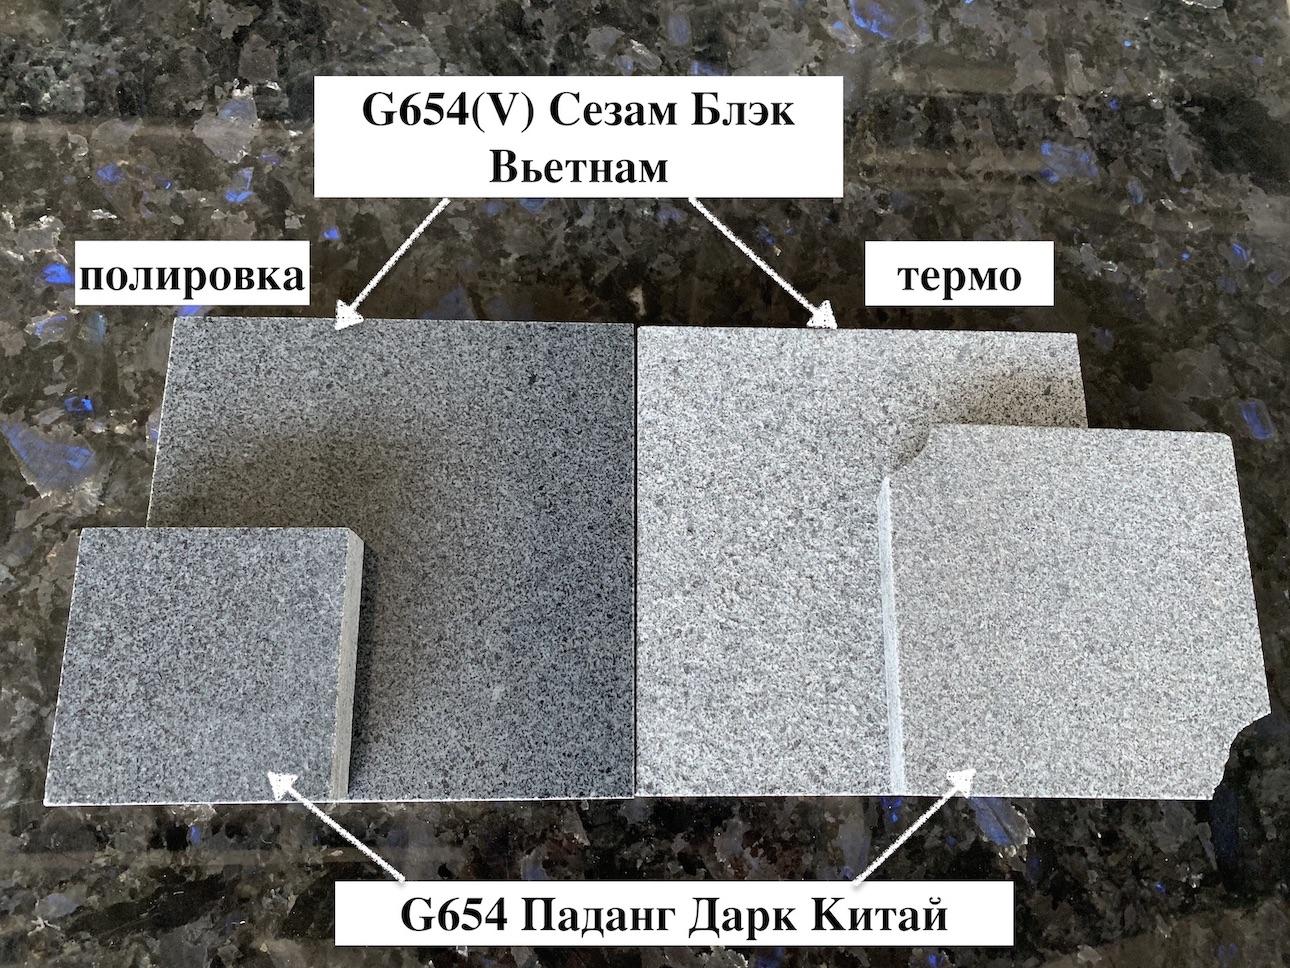 G654(V) Sesame Black фото 614a090c9b329